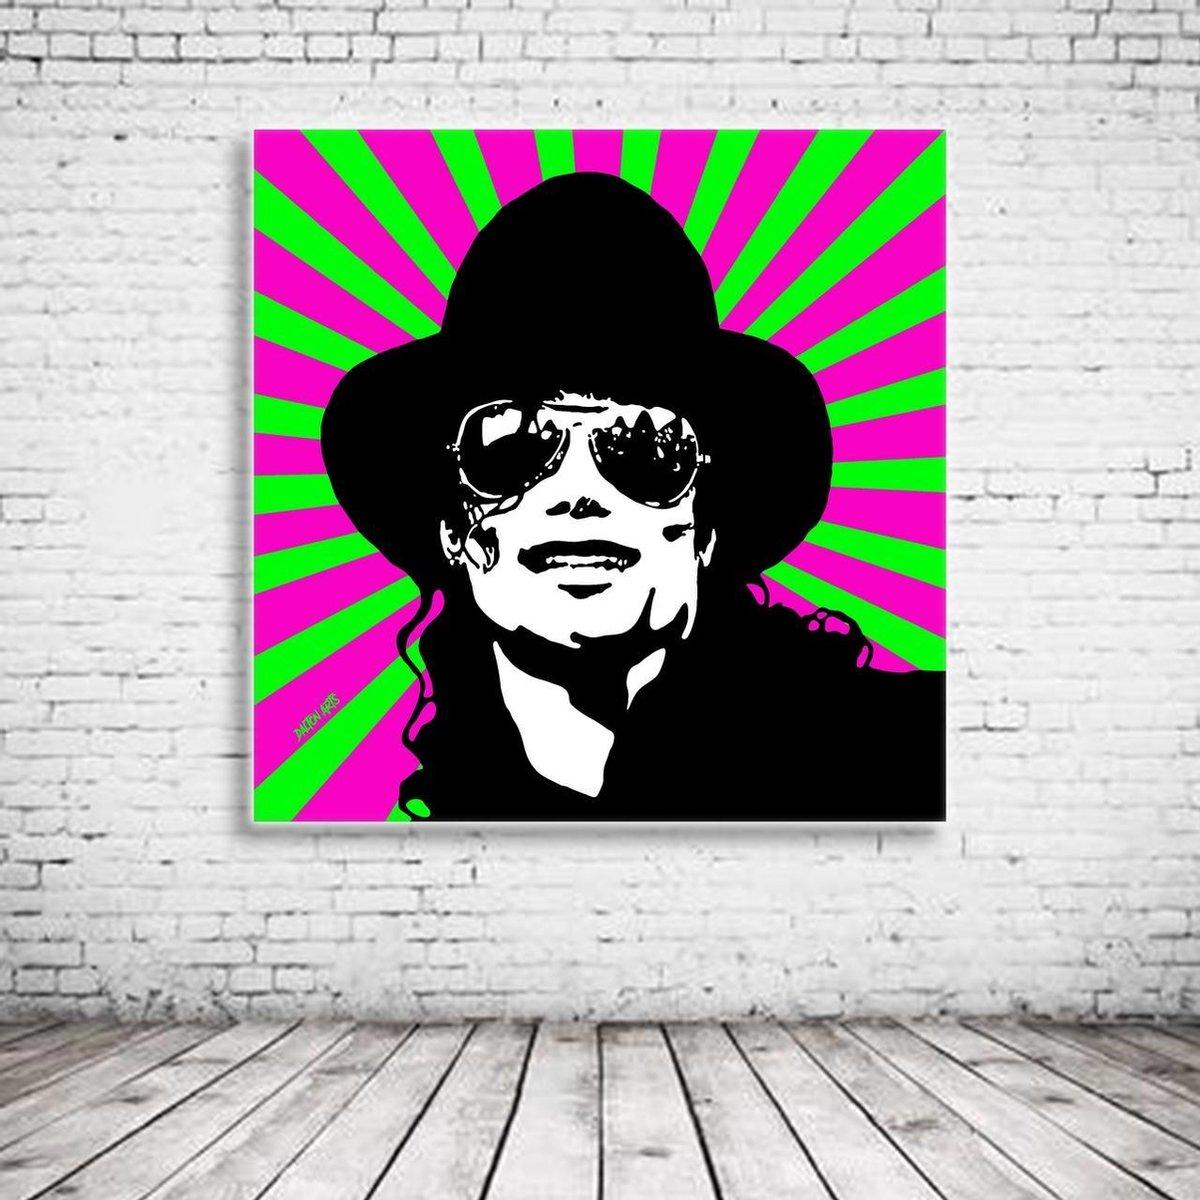 Pop Art Michael Jackson Canvas - 90 x 90 cm - Canvasprint - Op dennenhouten kader - Geprint Schilderij - Popart Wanddecoratie